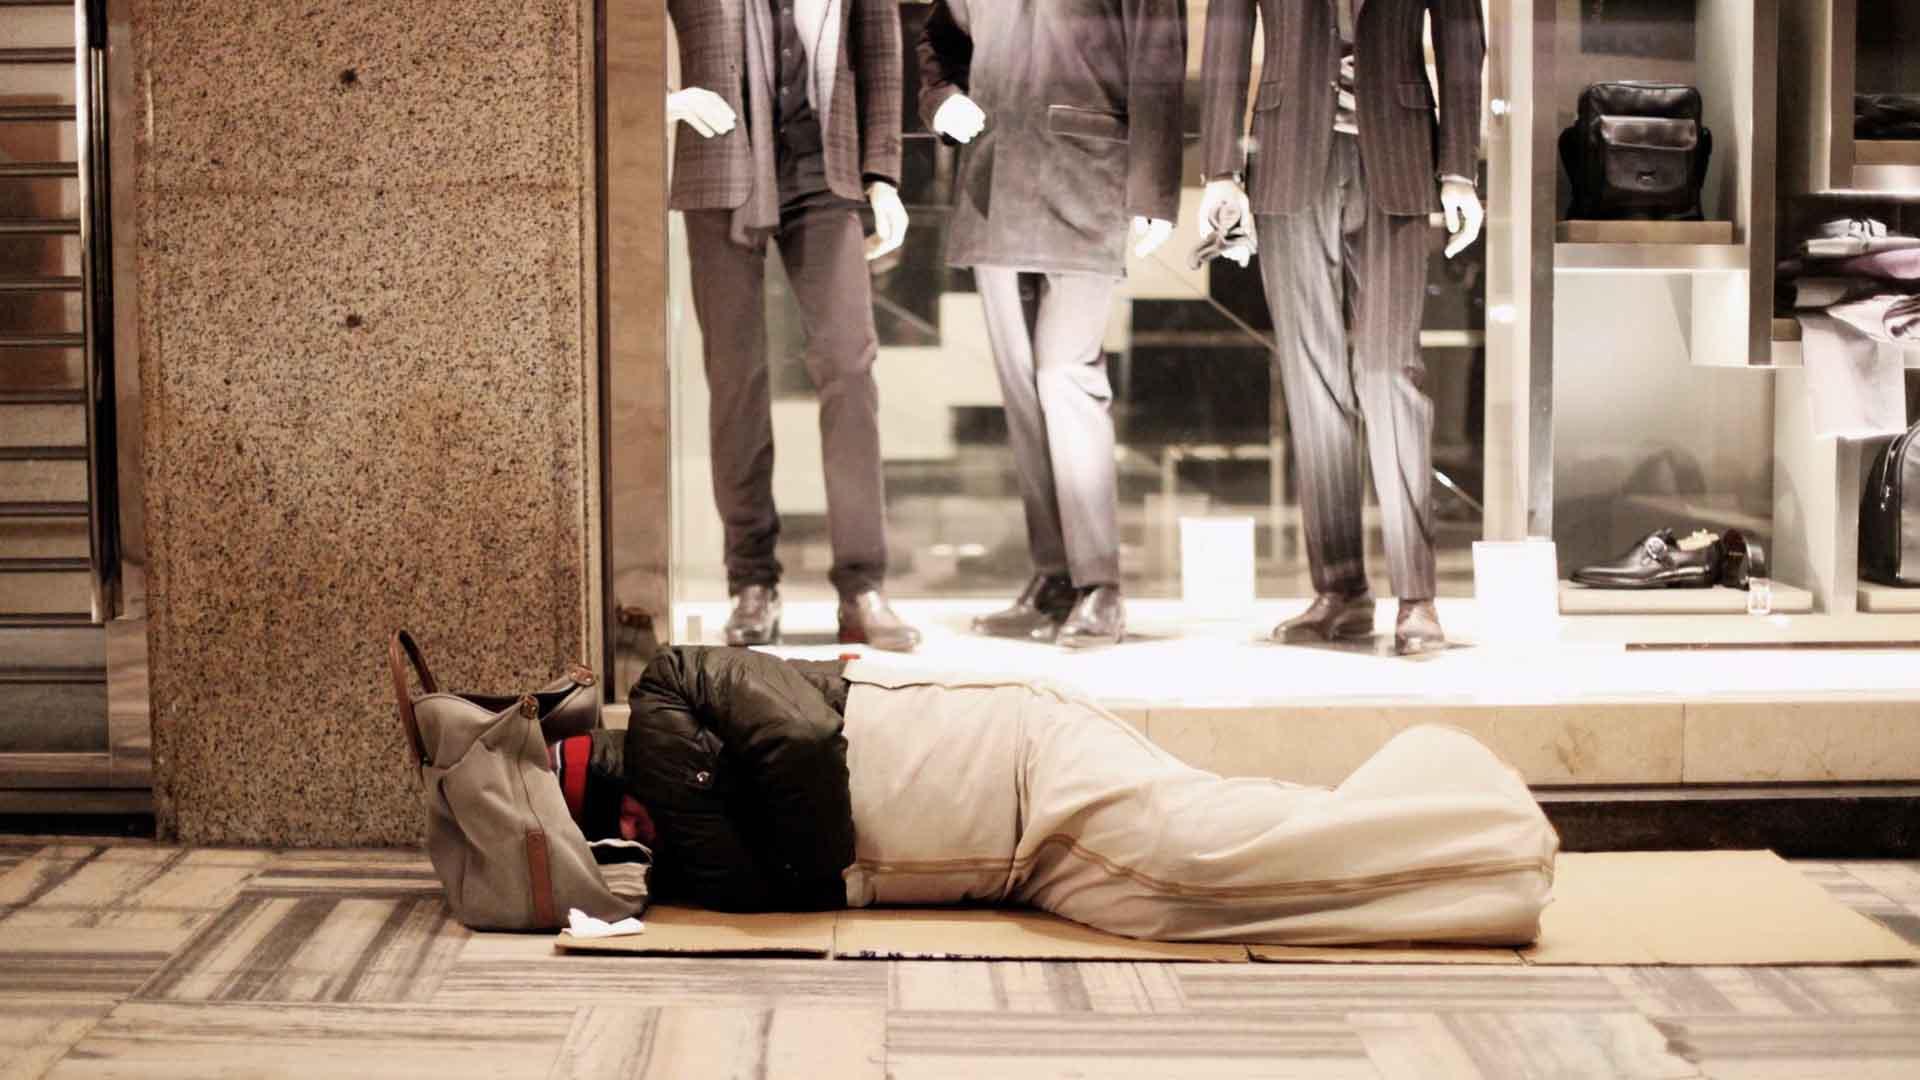 senzatetto quarantena coronavirus